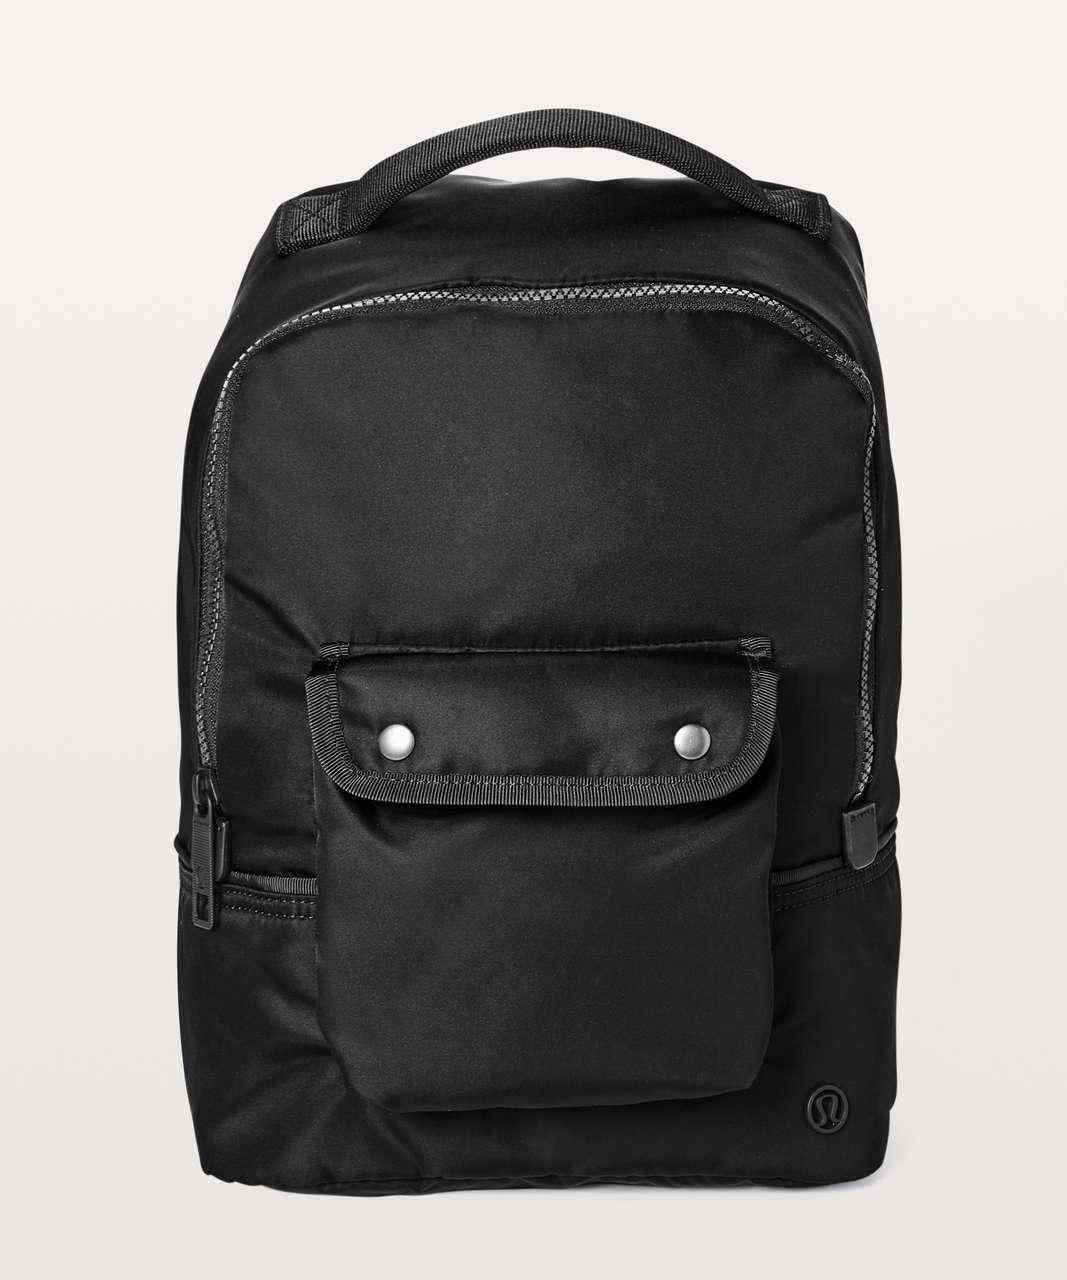 Lululemon City Adventurer Utility Pack 12L - Black